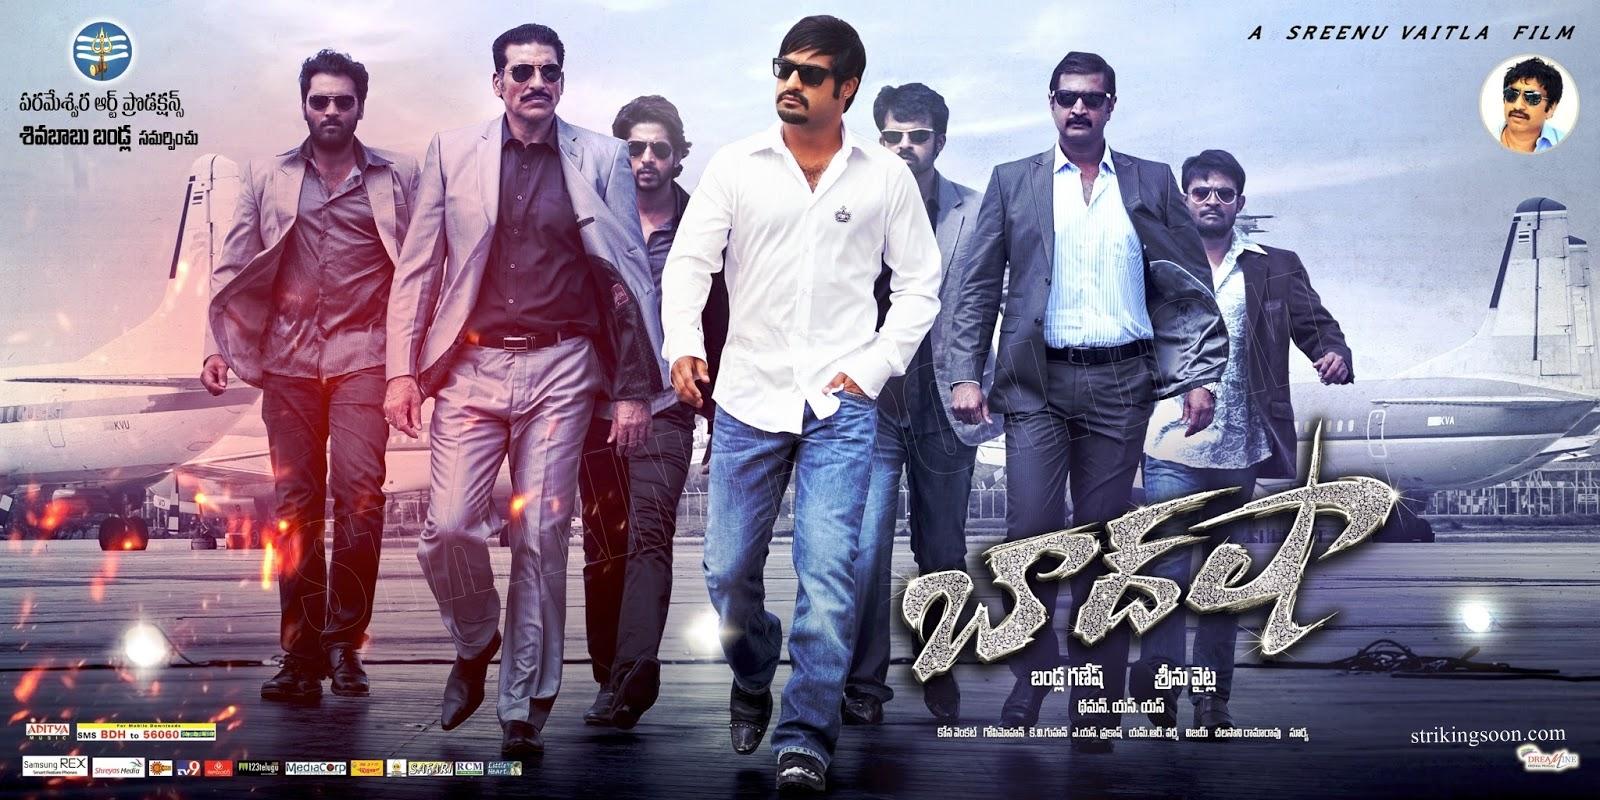 Baadshah (2013) Telugu Movie HD Wallpapers - AtoZAllmovie Baadshah 2013 Film